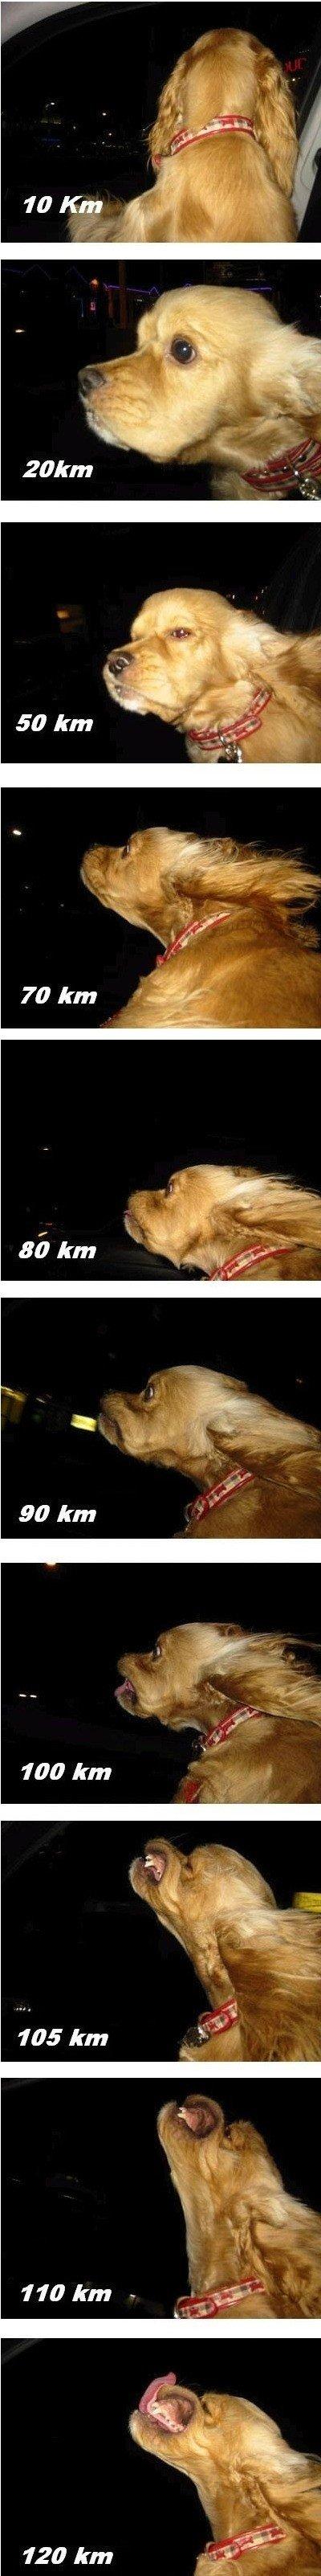 Speedy Dawg. . 90 km. at 90k it looks like his drinking